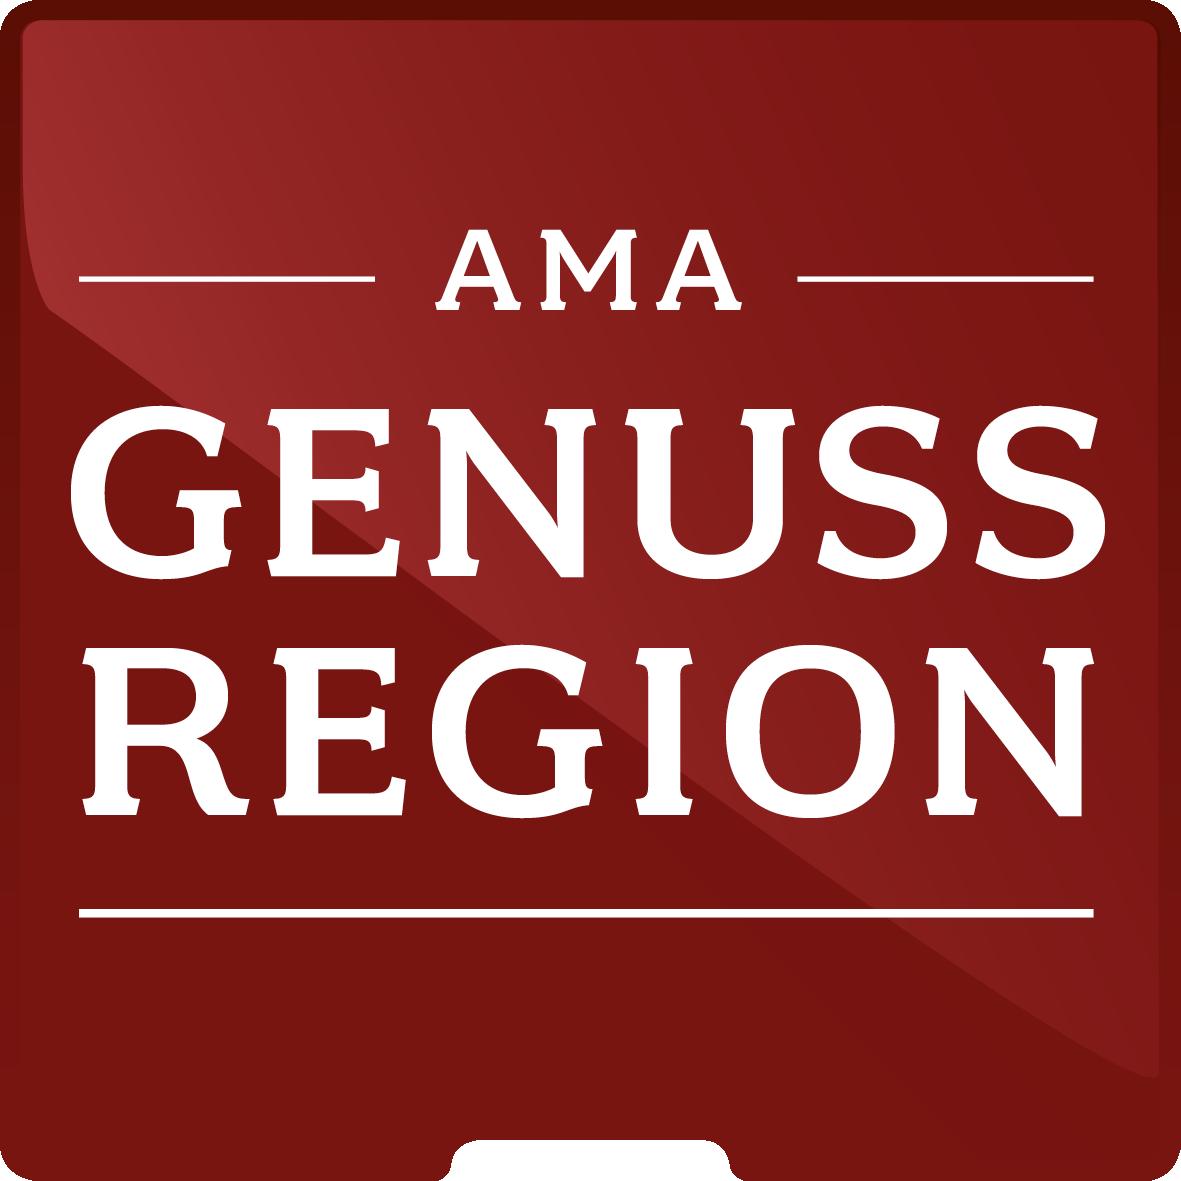 AMA Genussregion Siegel